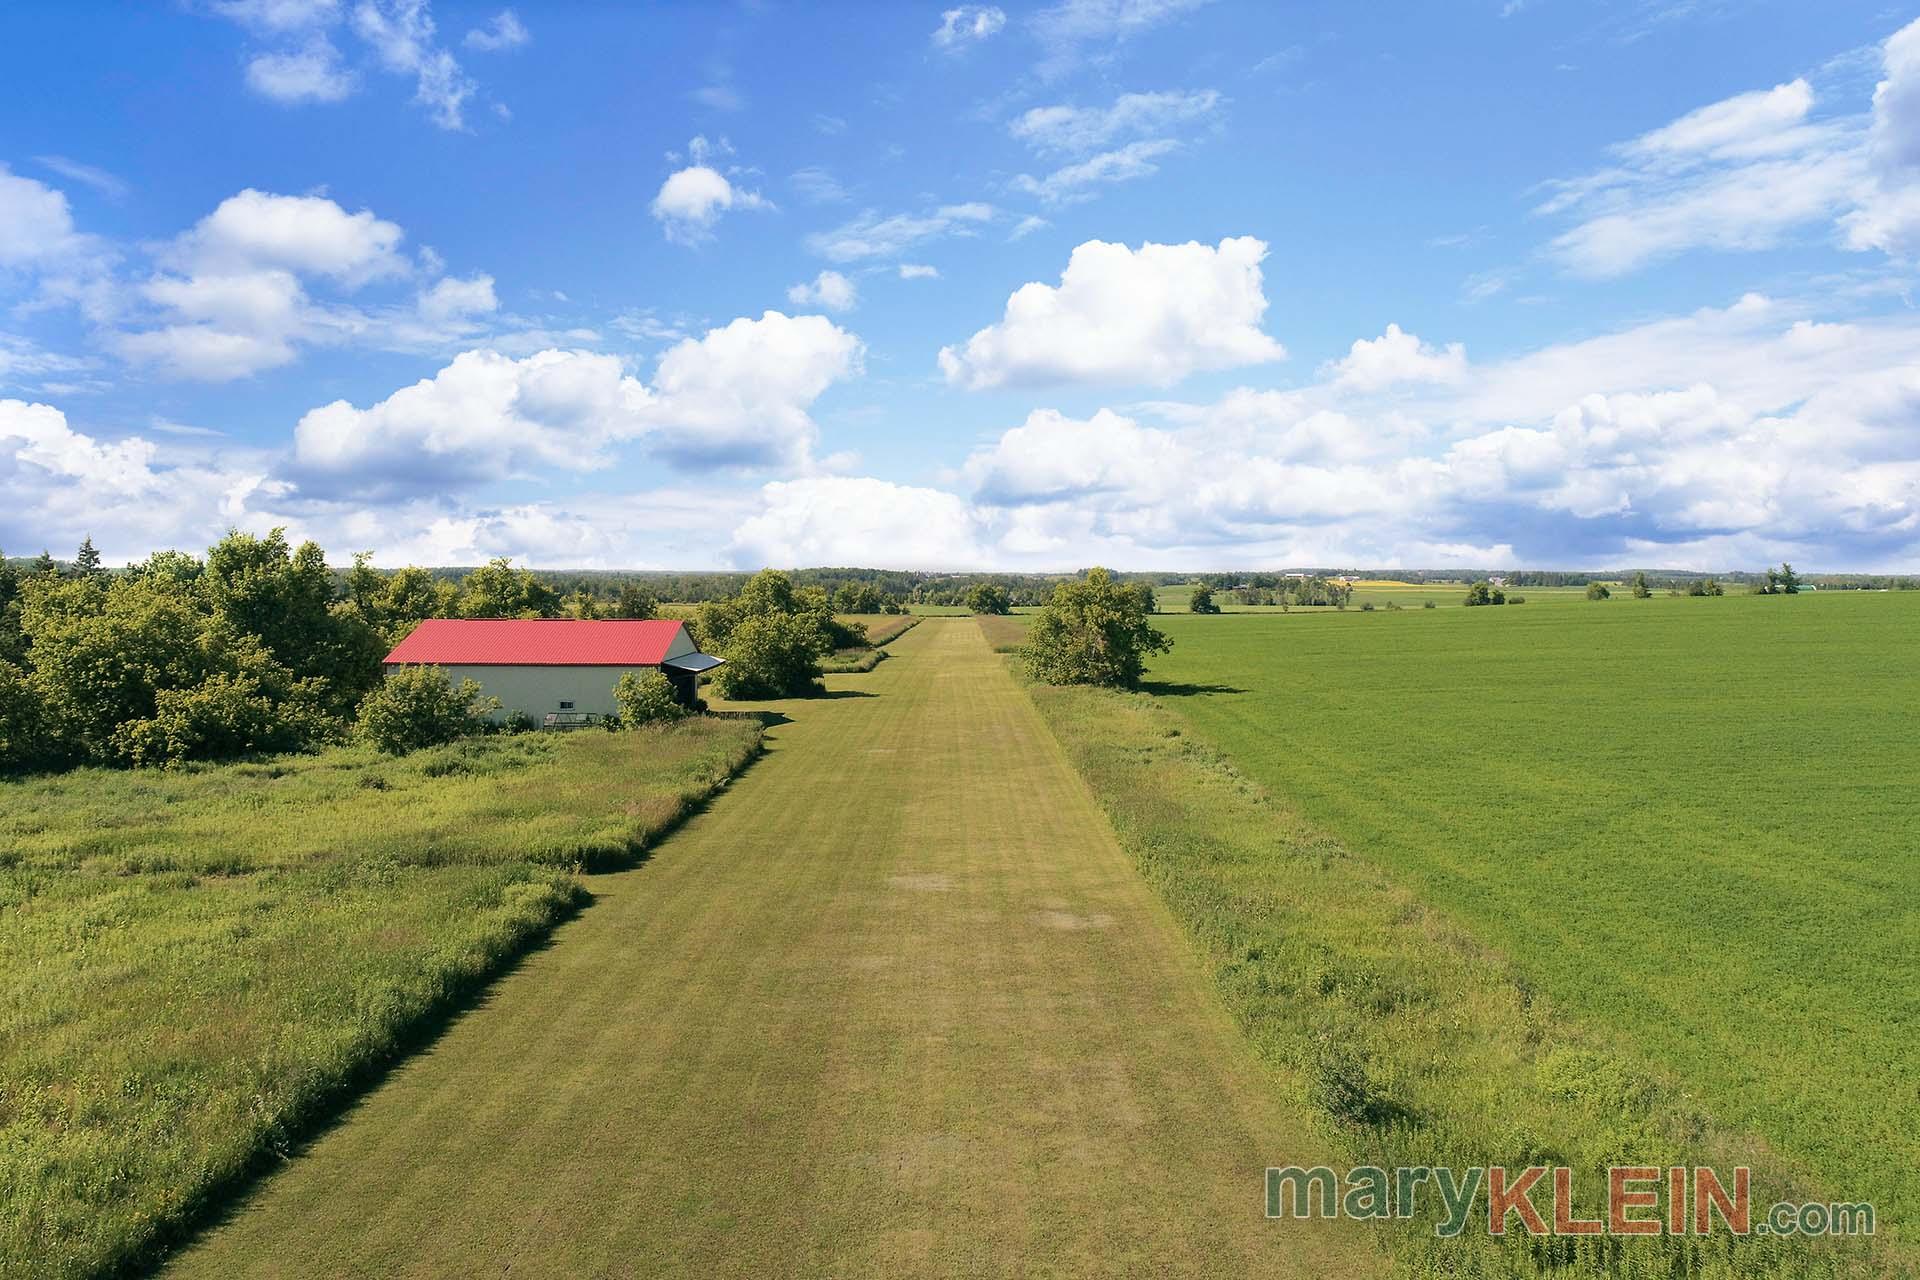 landing strip, runway